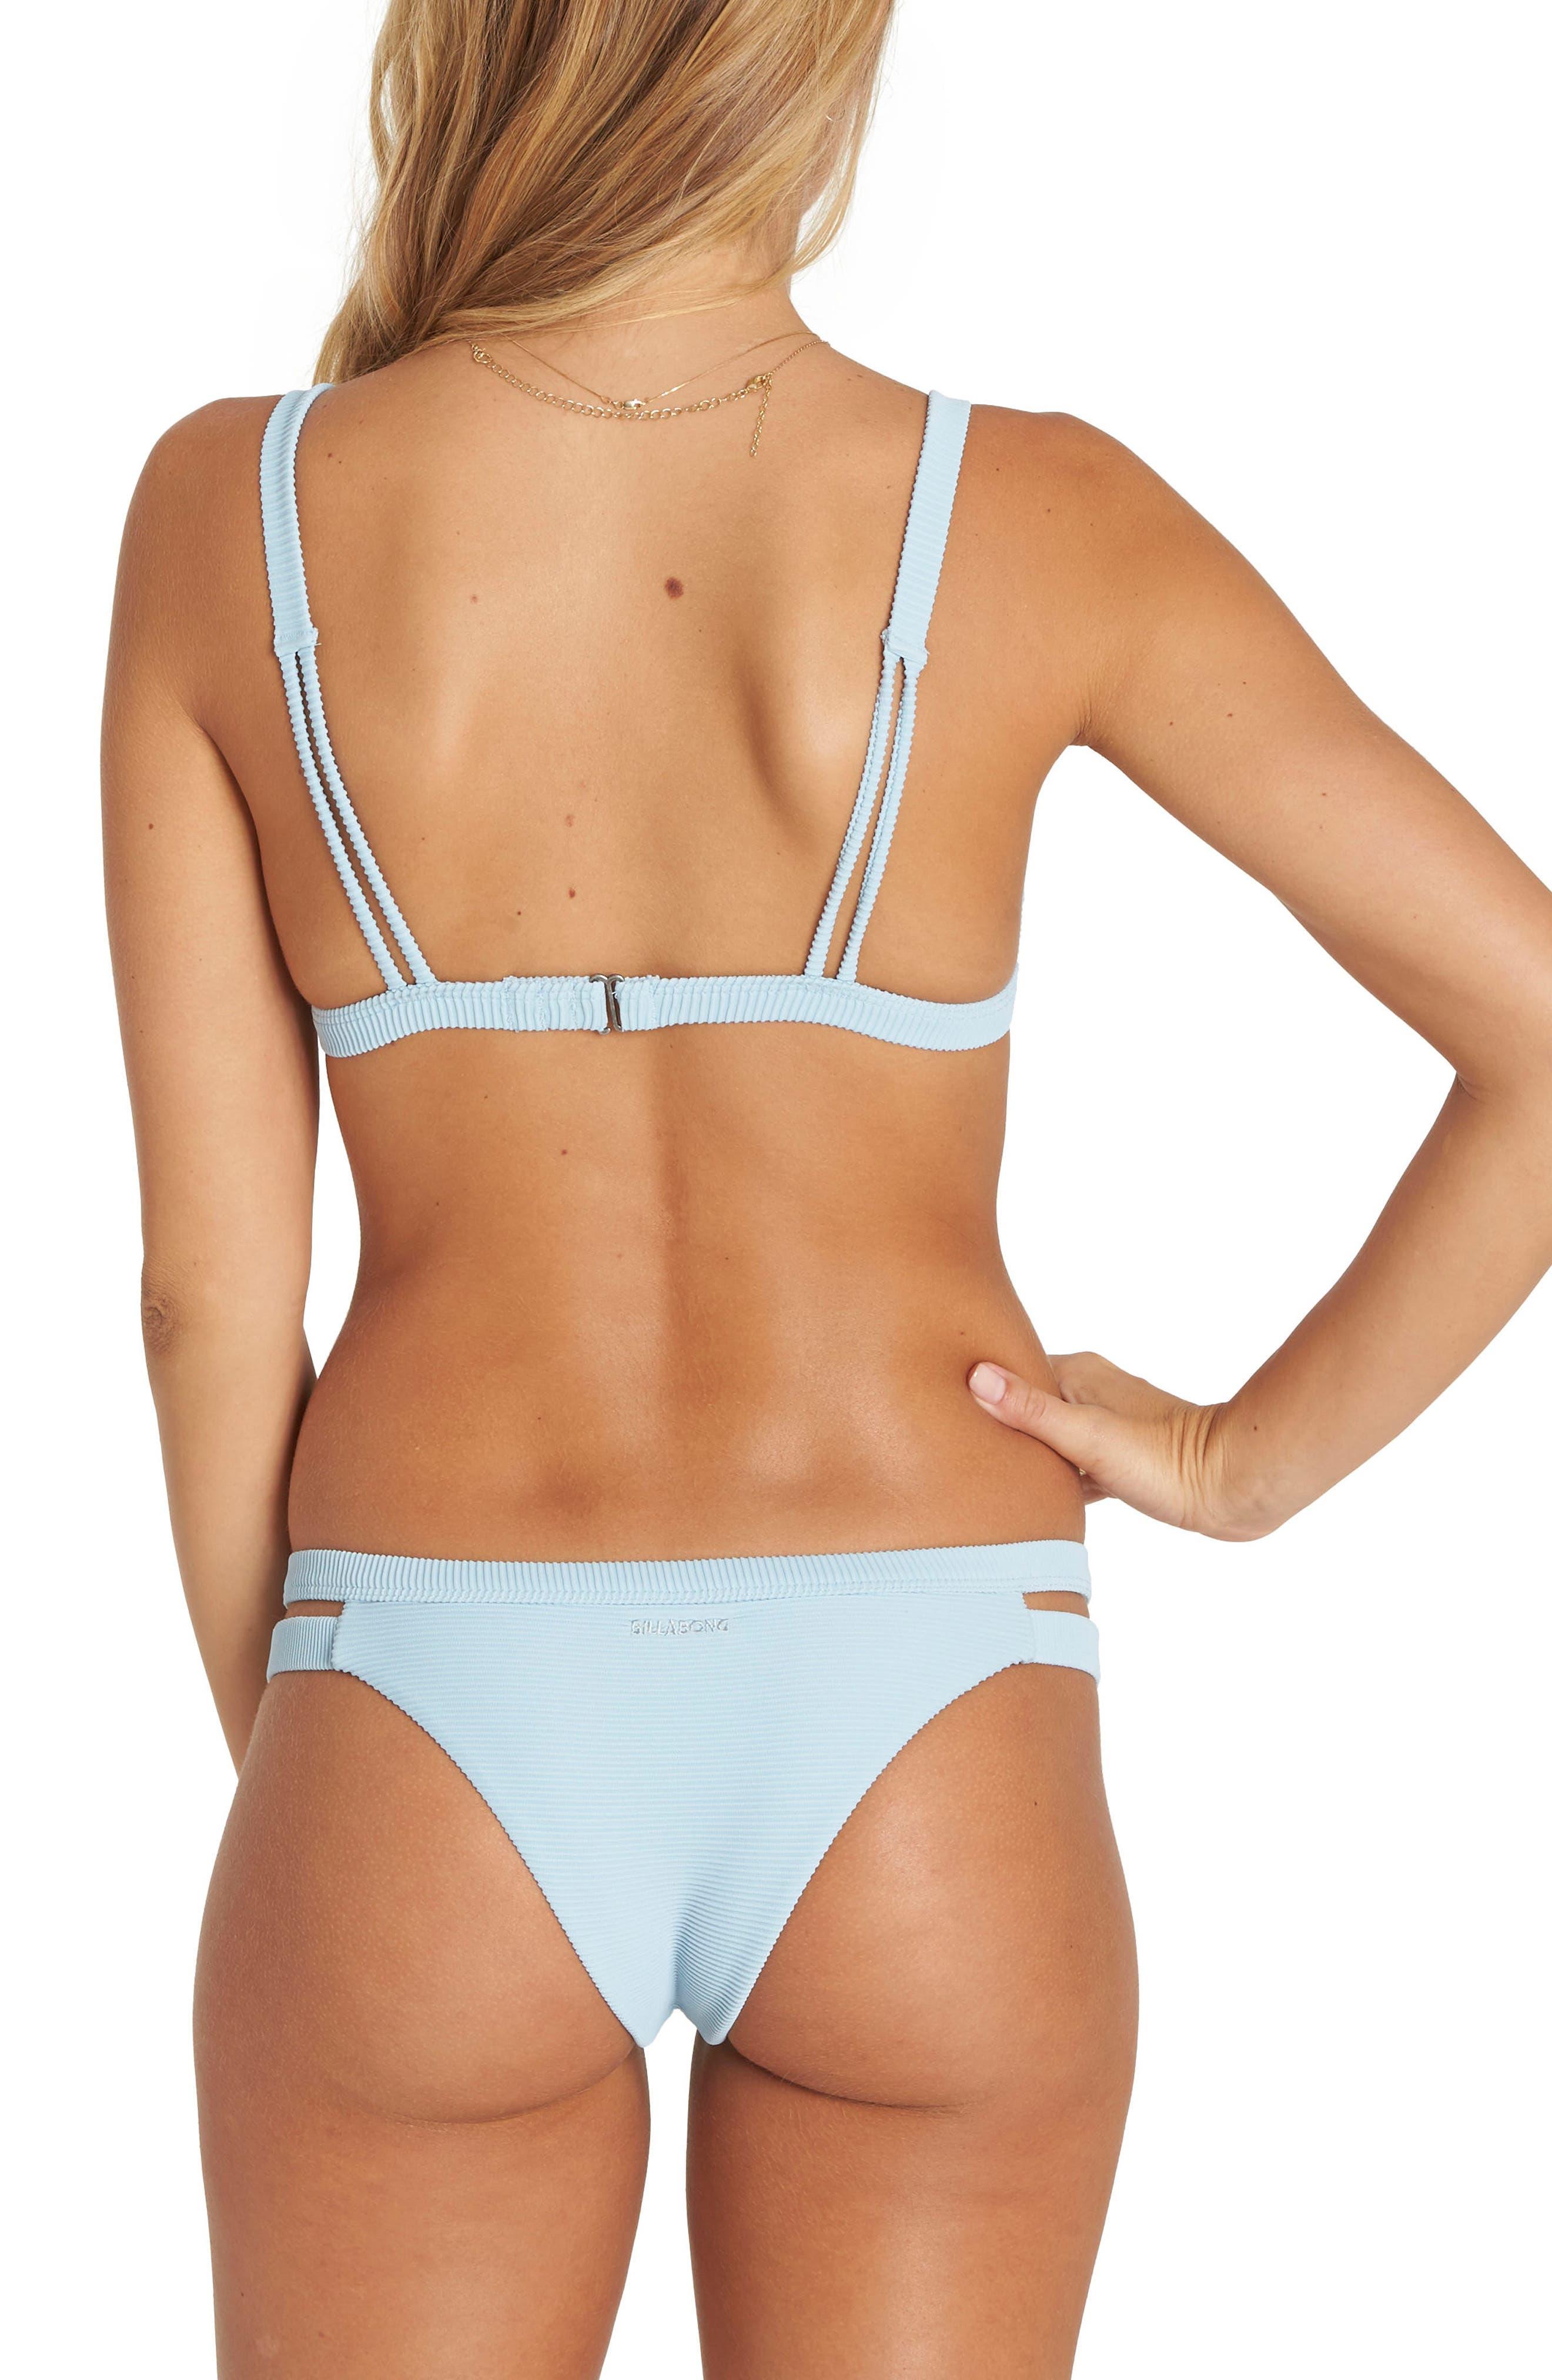 Tanlines Triangle Bikini Top,                             Alternate thumbnail 2, color,                             Cool Water